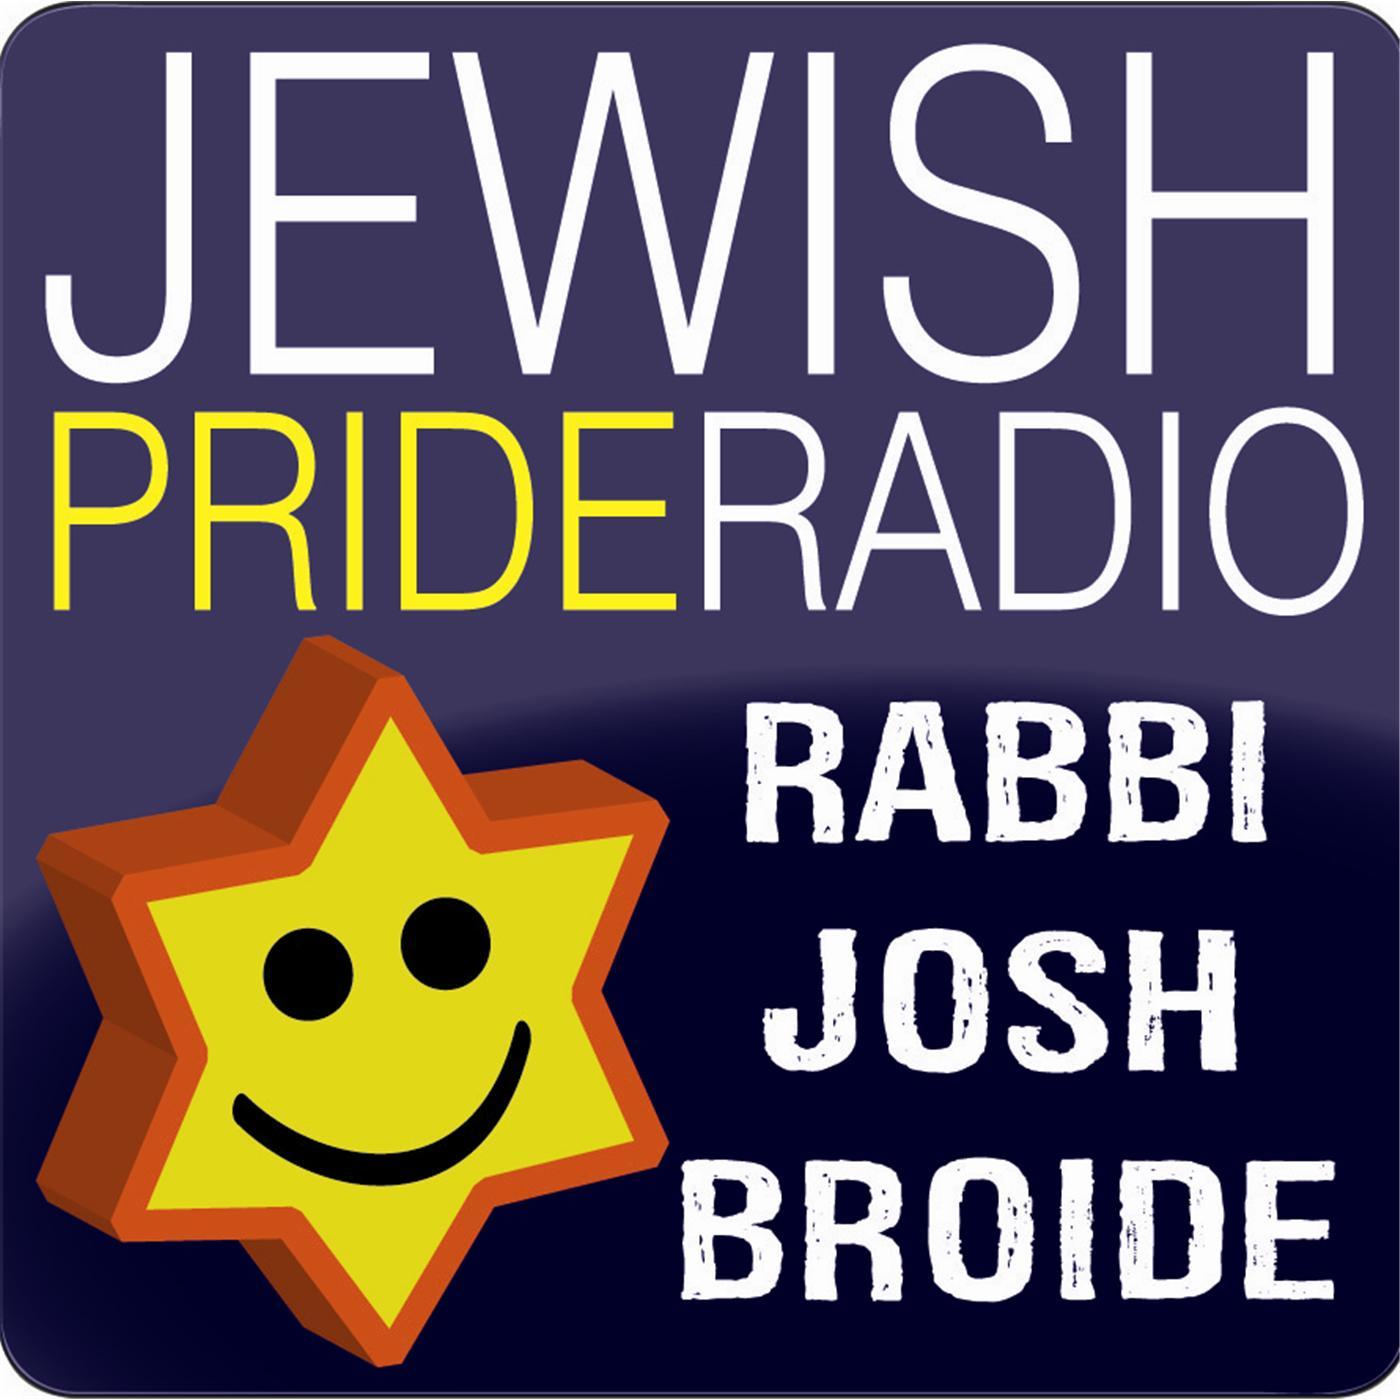 Jewish Pride Radio Rabbi Josh Broide By Josh Broide On Apple Podcasts